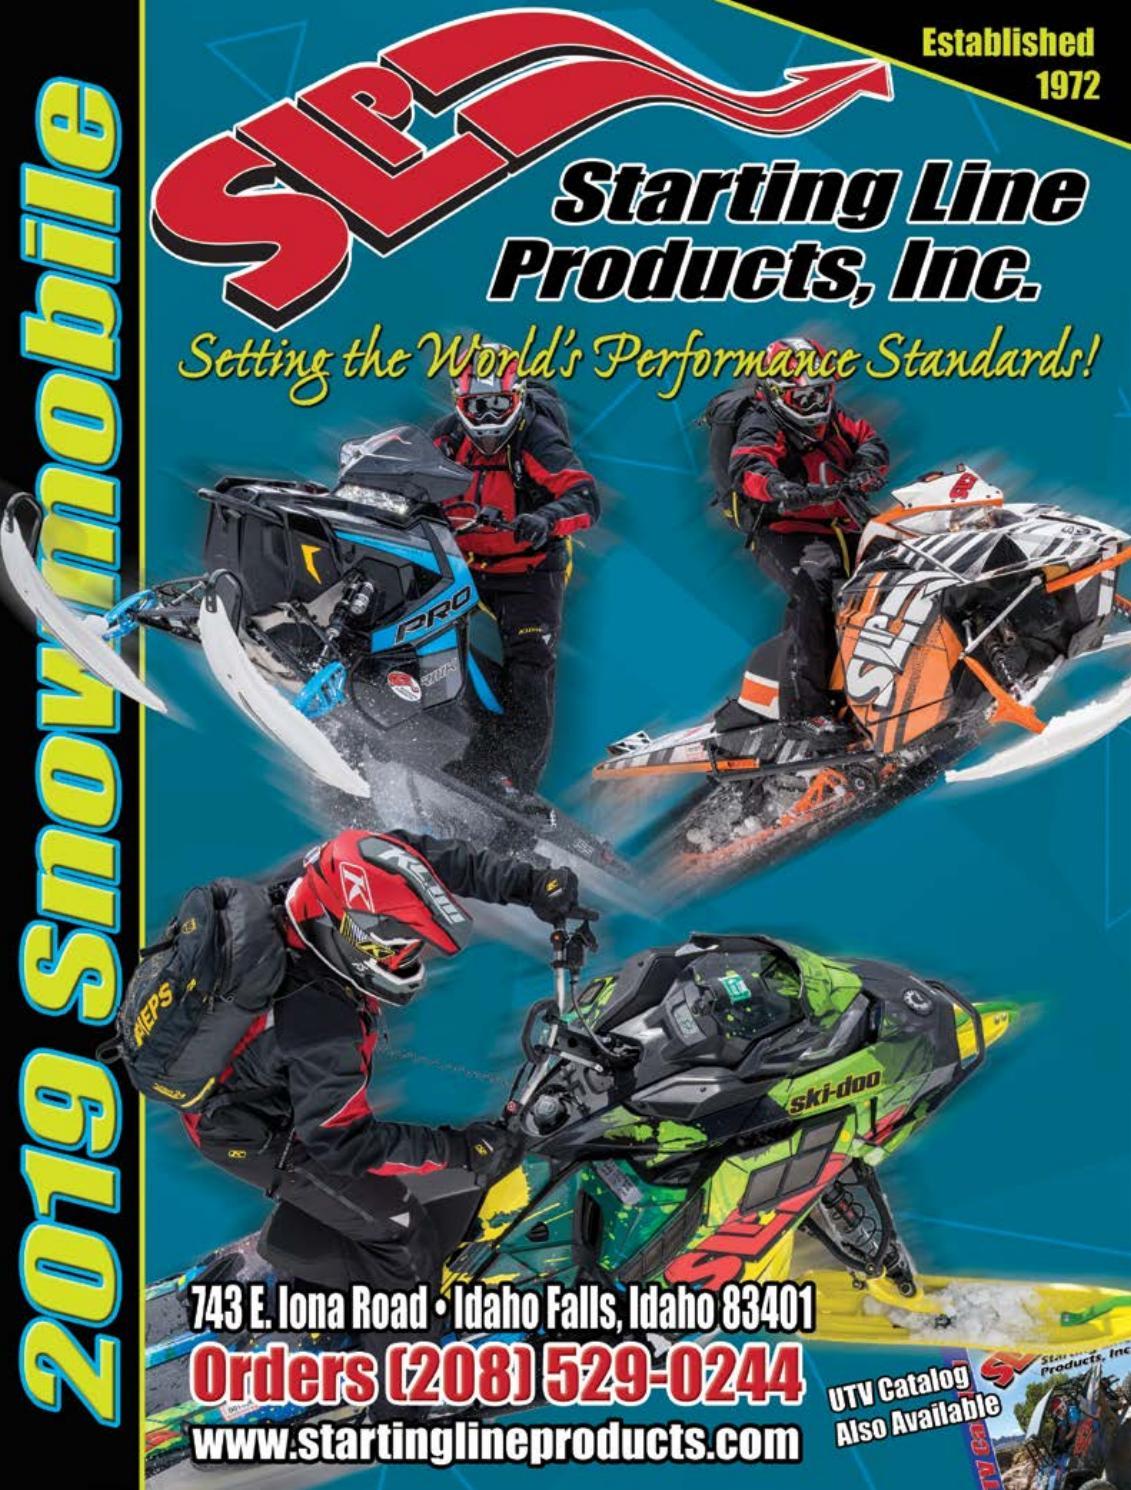 CLUTCH PULLER for snowmobile POLARIS All Fuji Motors 1999-2006